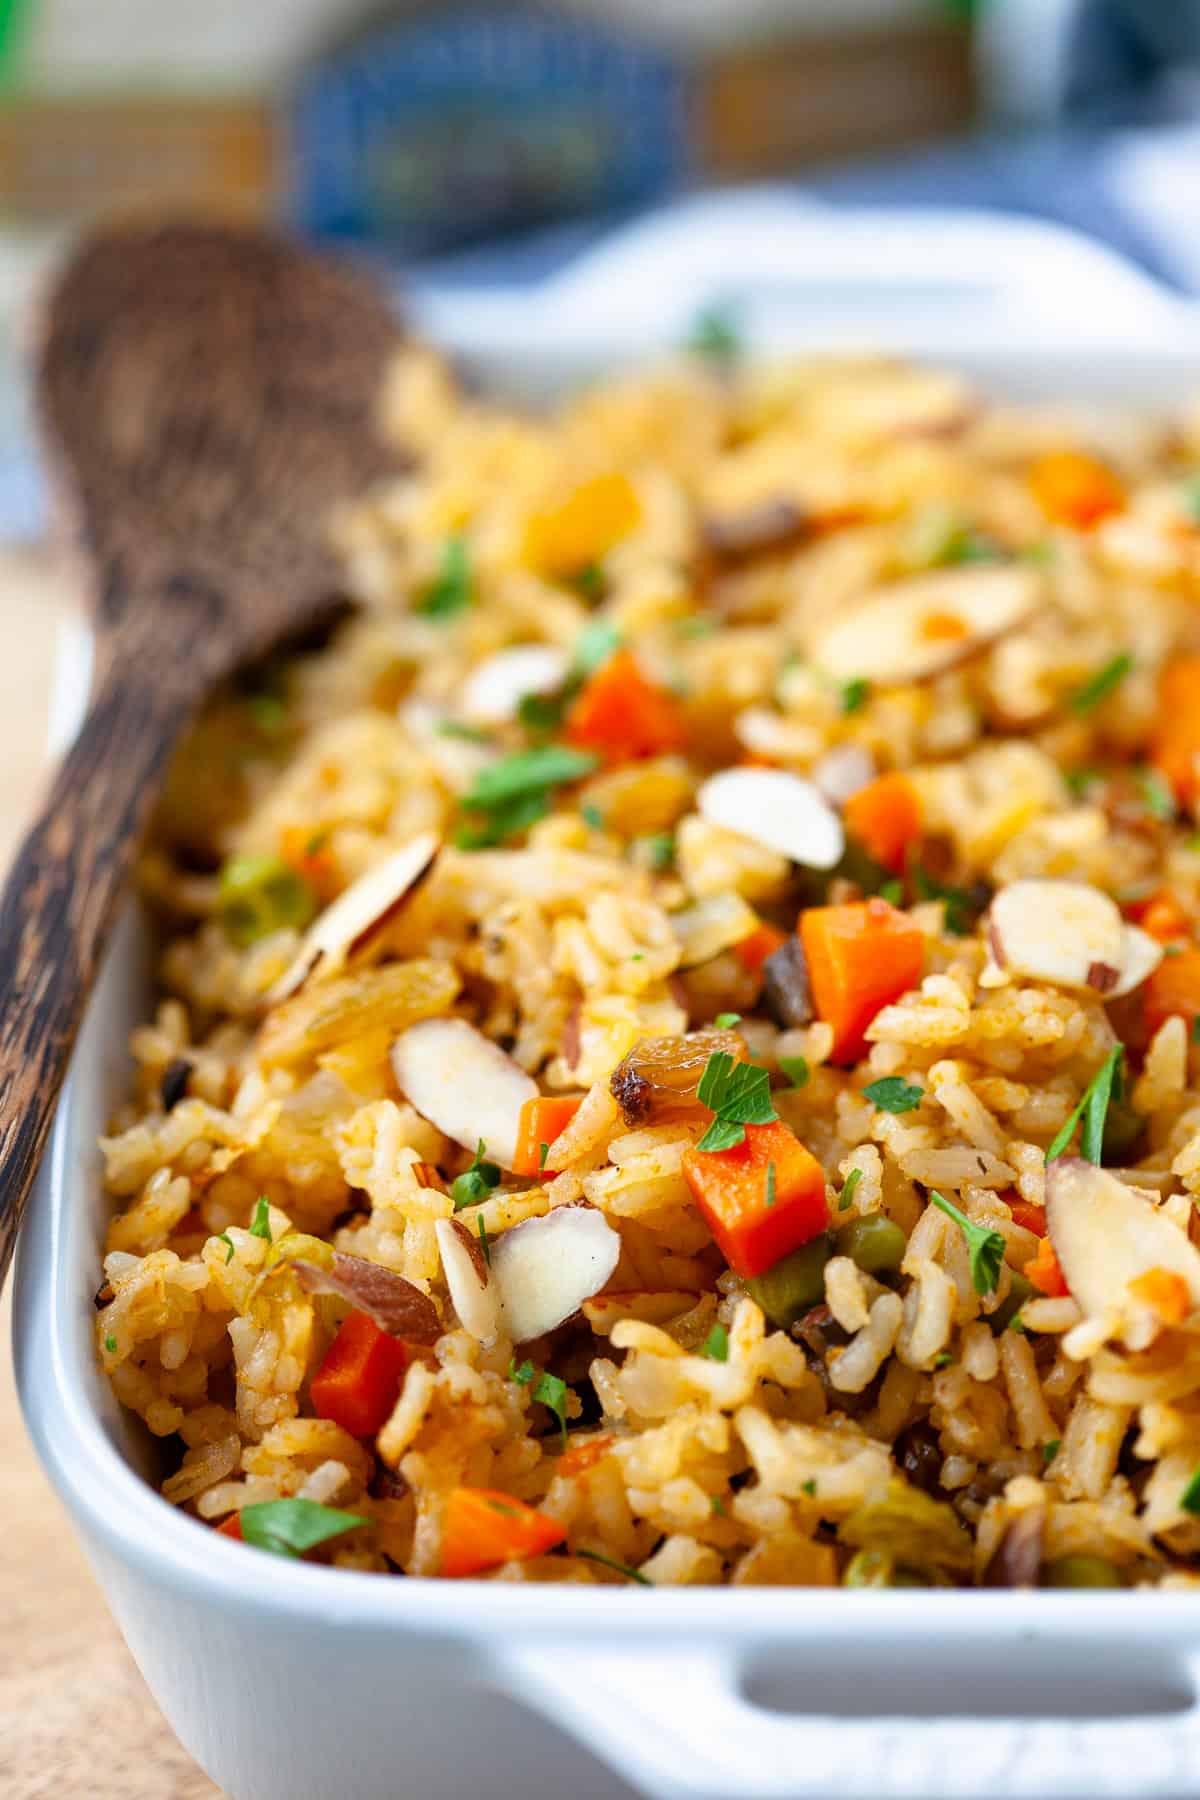 vegetarian rice pilaf casserole dish with wooden spoon long grain white rice, sliced almonds, golden raisins